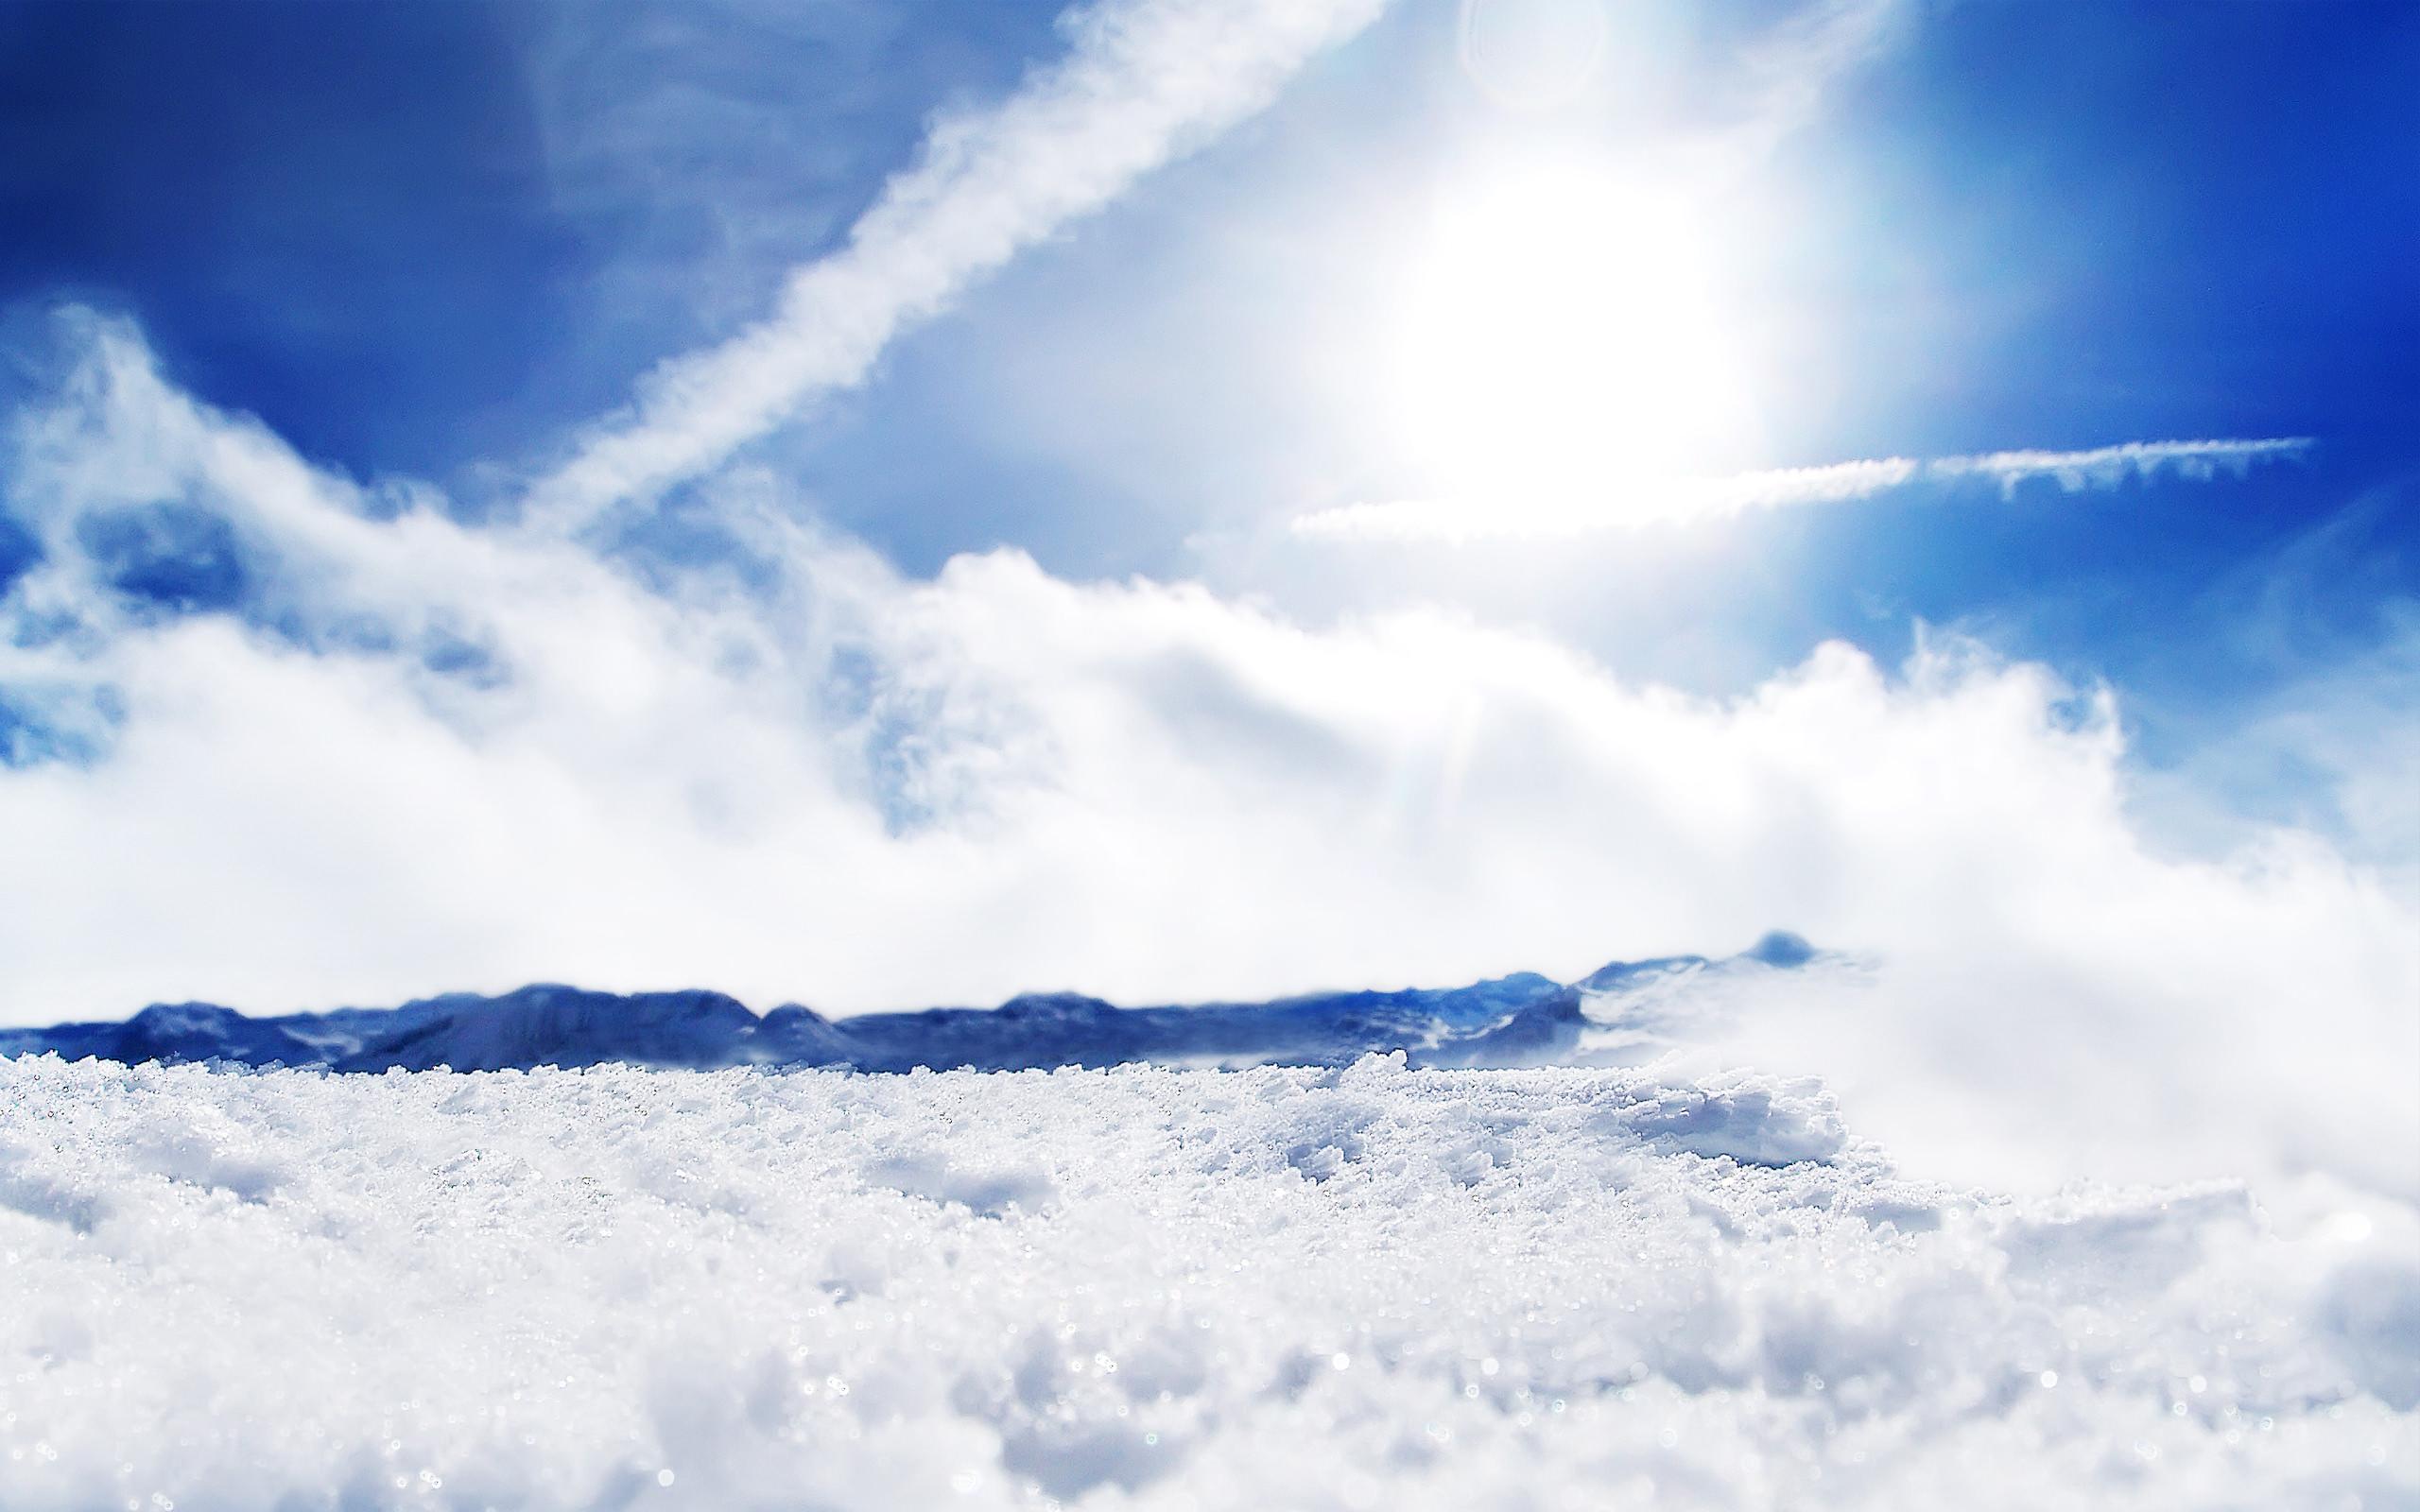 Sunny Snow Wallpaper